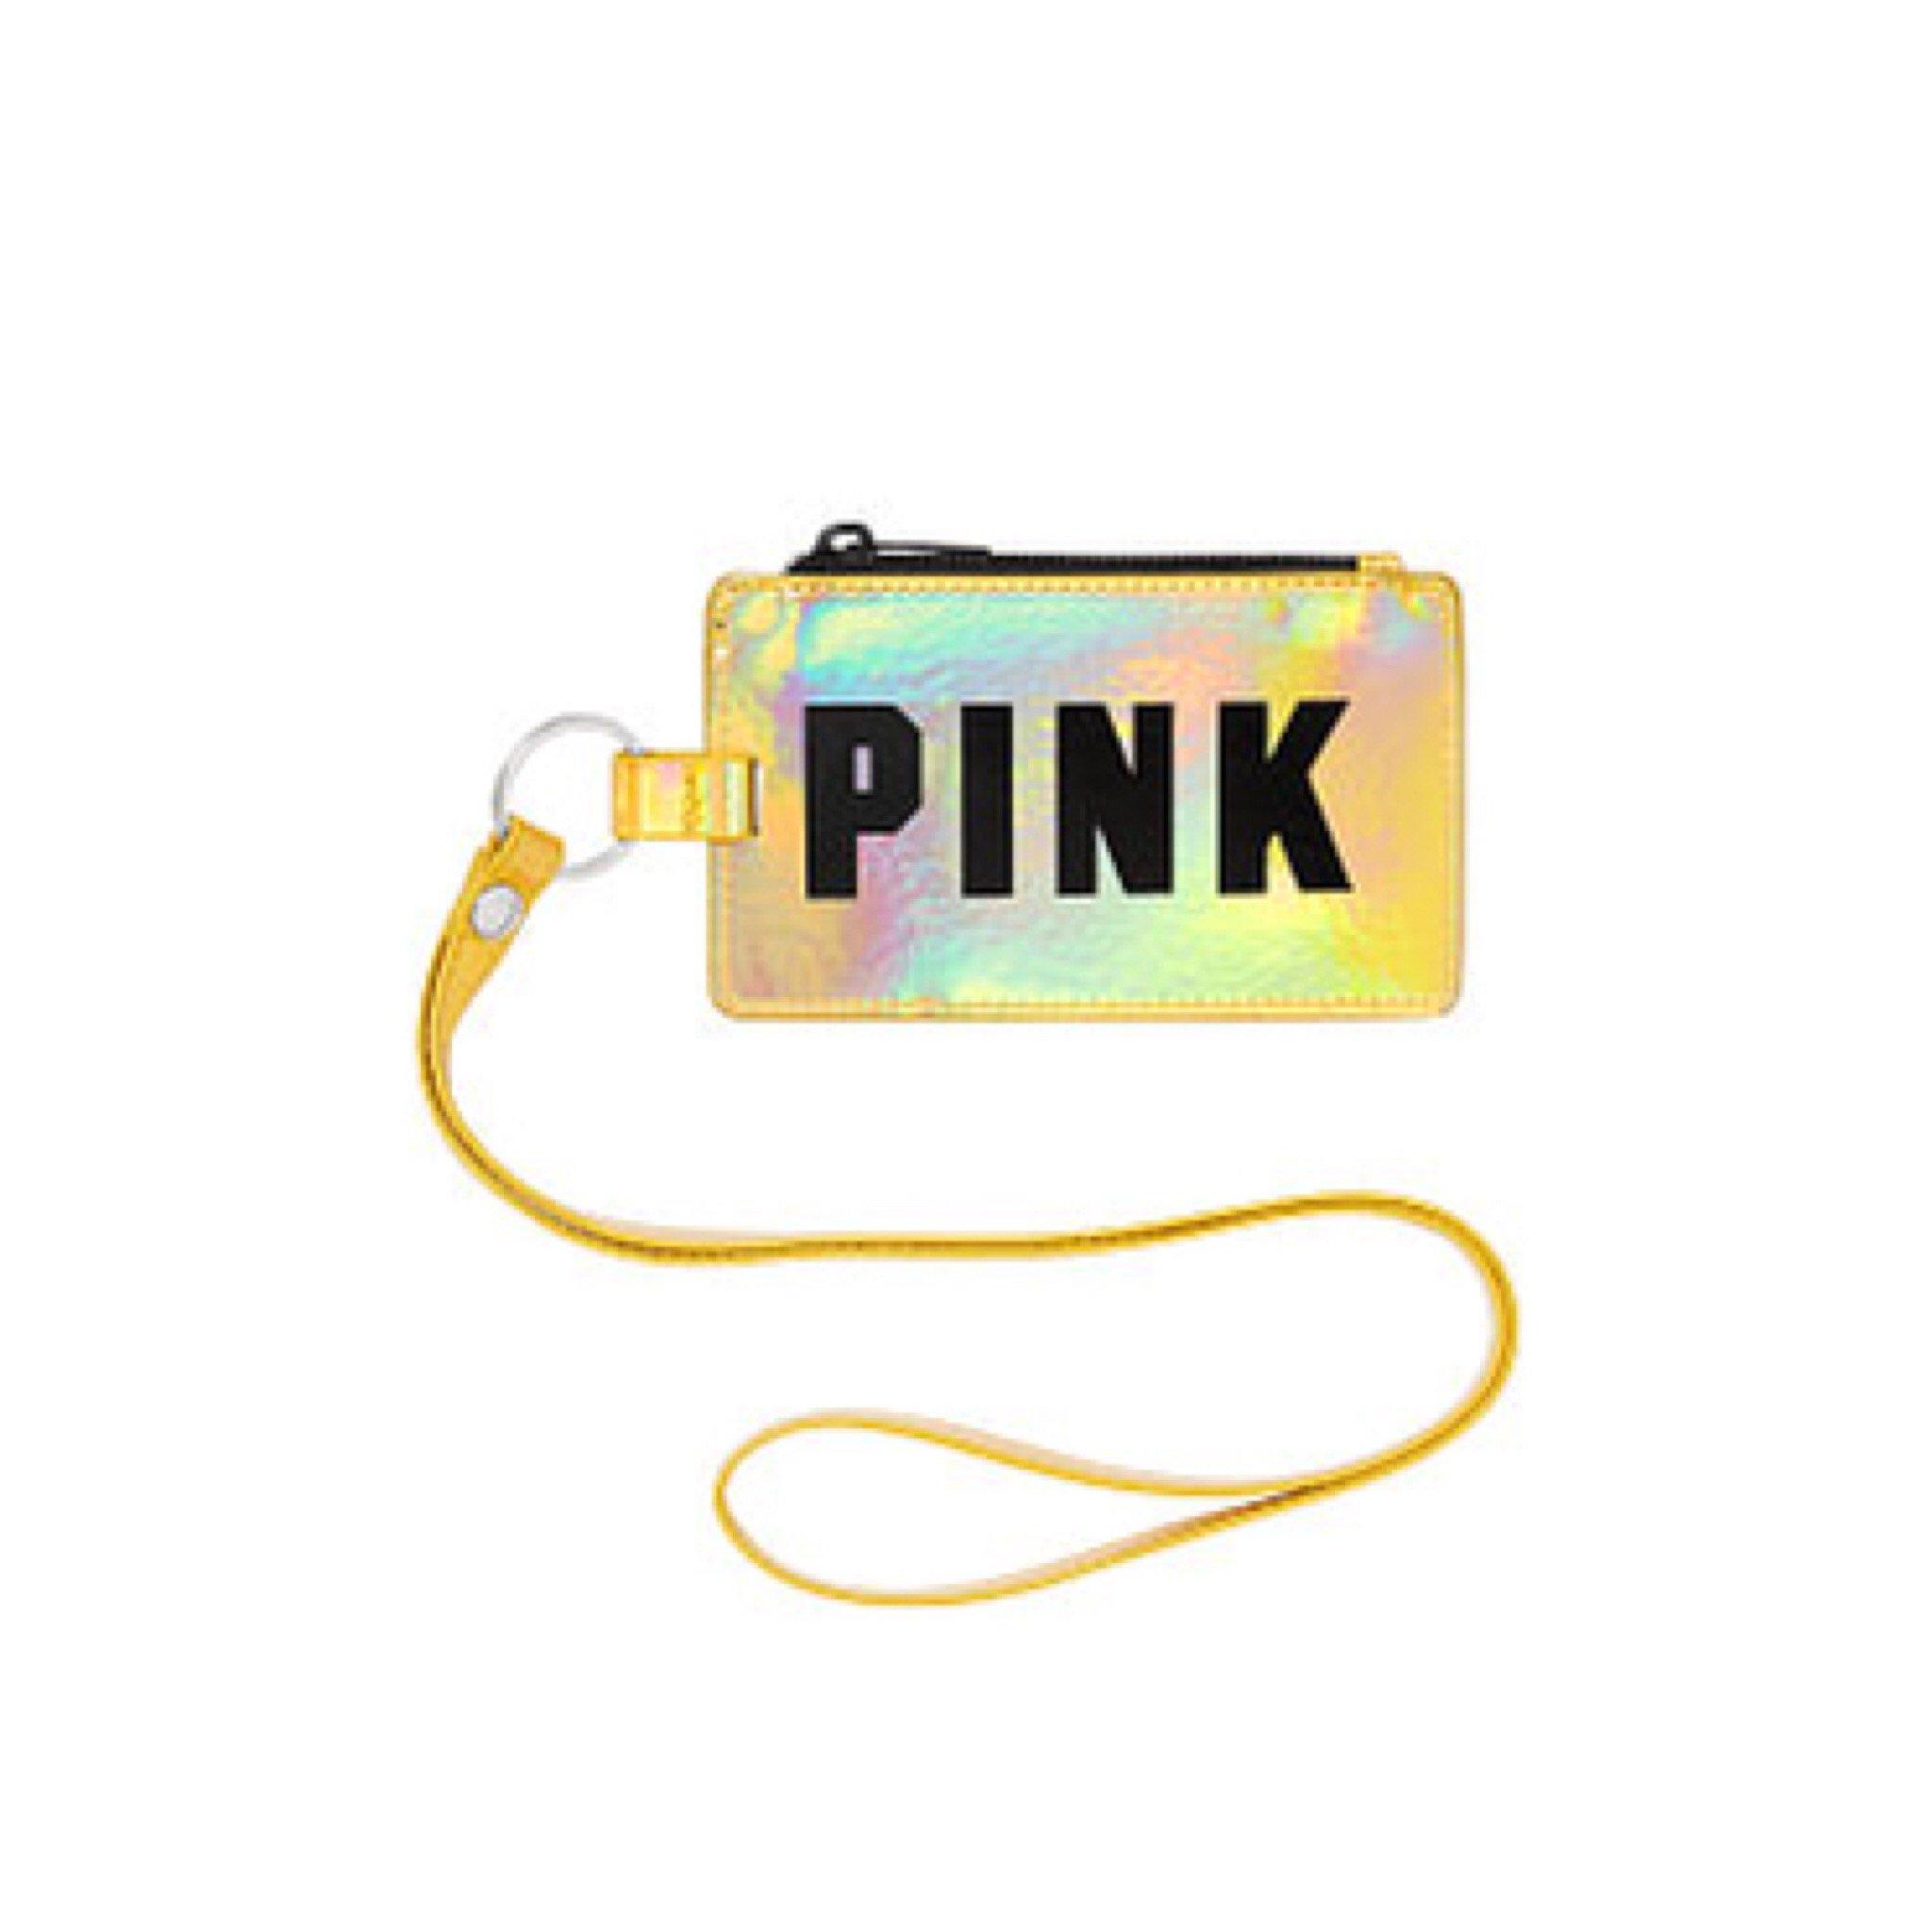 Victoria's Secret PINK Lanyard Gold